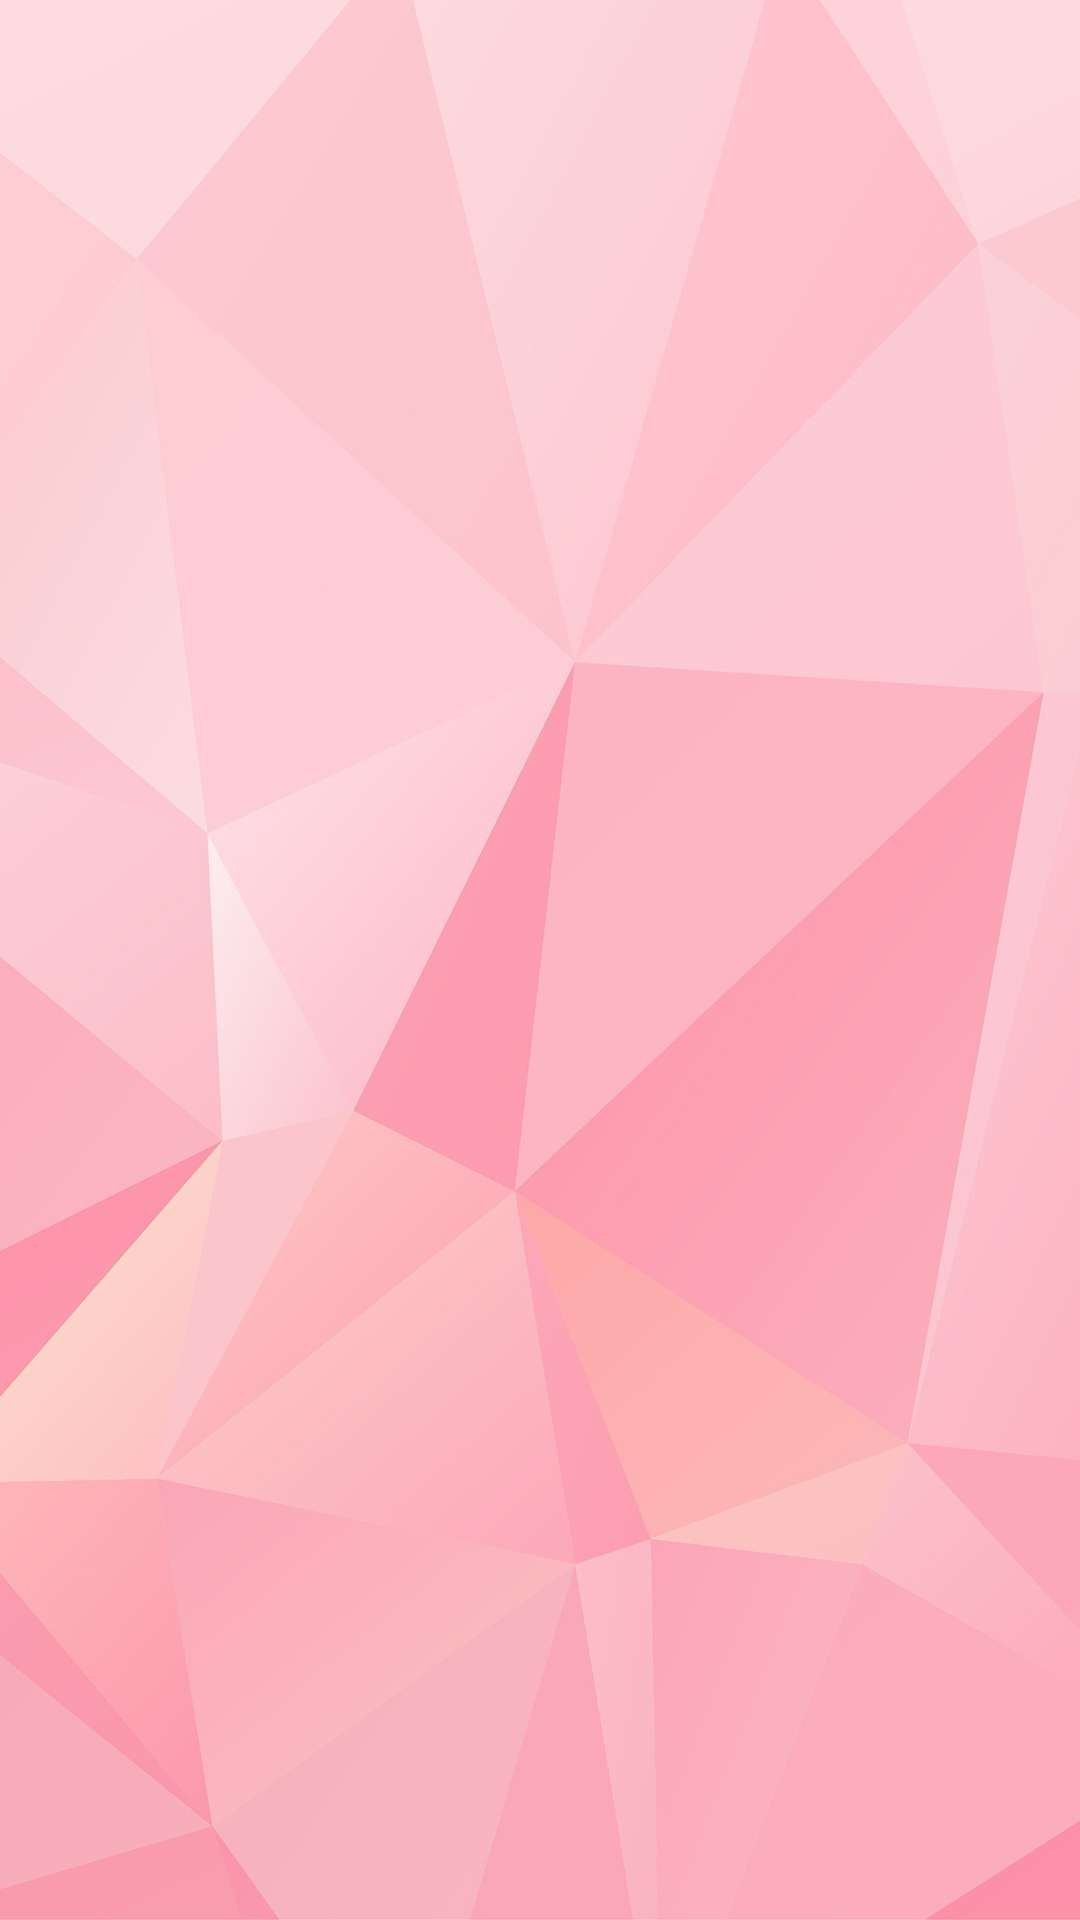 Geometric Iphone Wallpaper Geometric In 2019 Phone